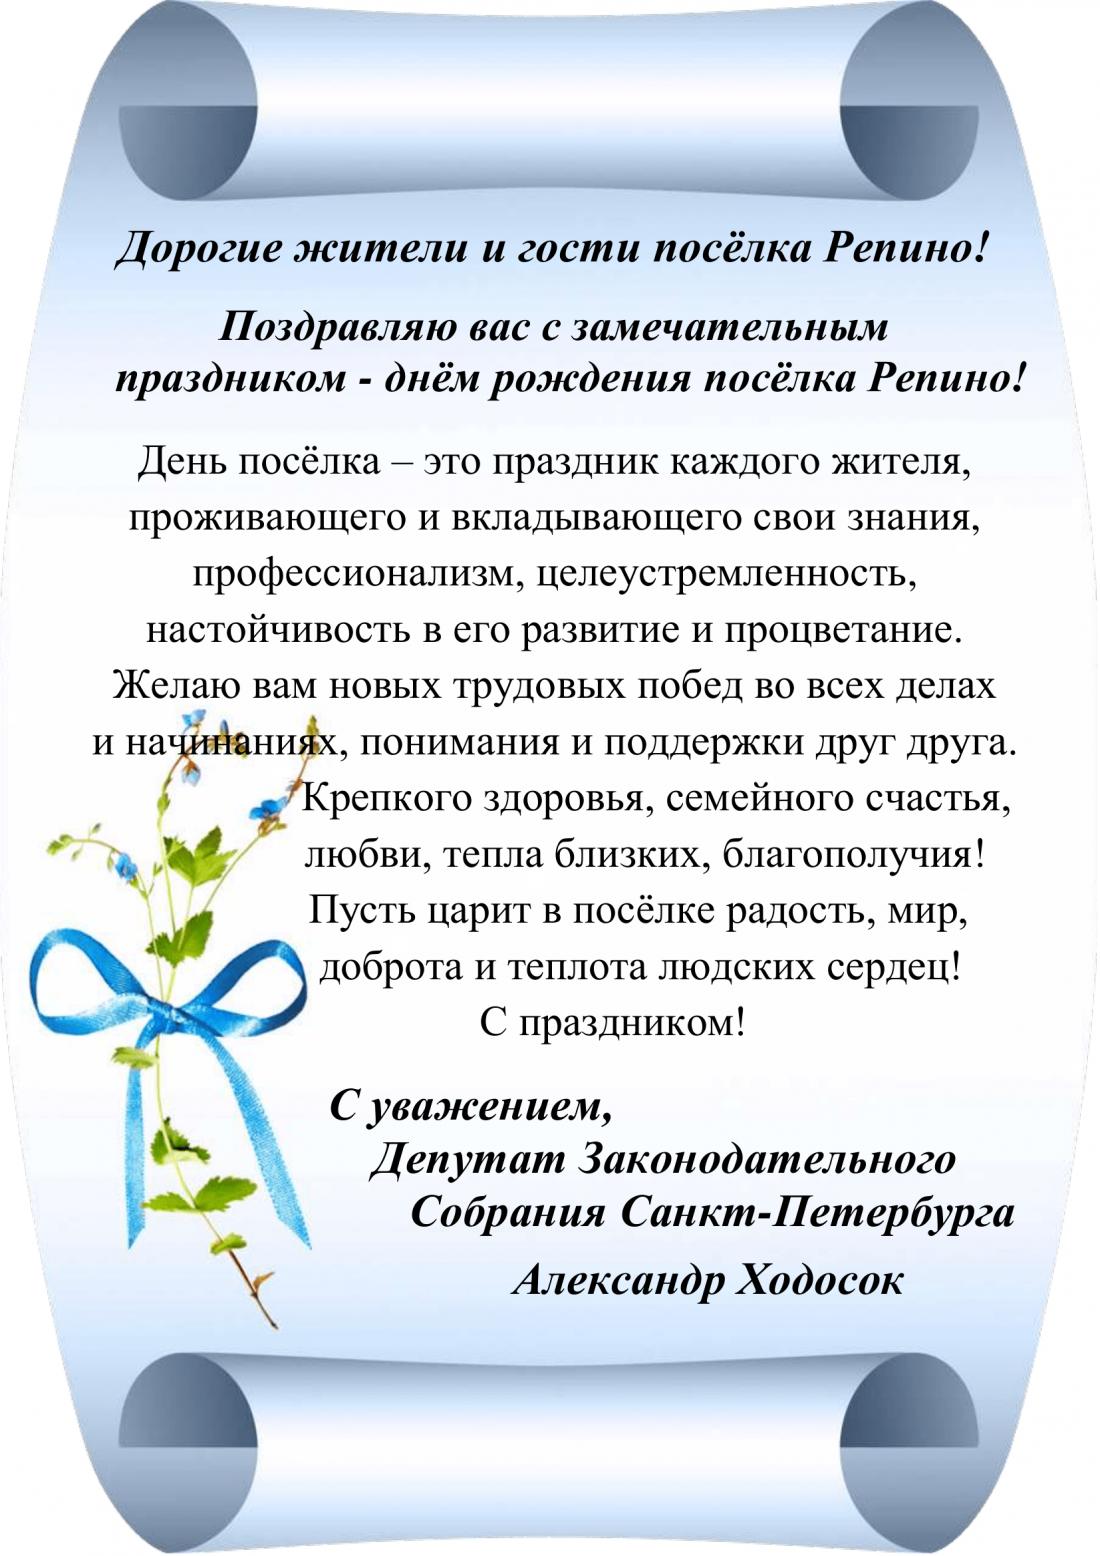 ПОЗДРАВЛЕНИЕ А.В. Ходоска с днем посёлка Репино..